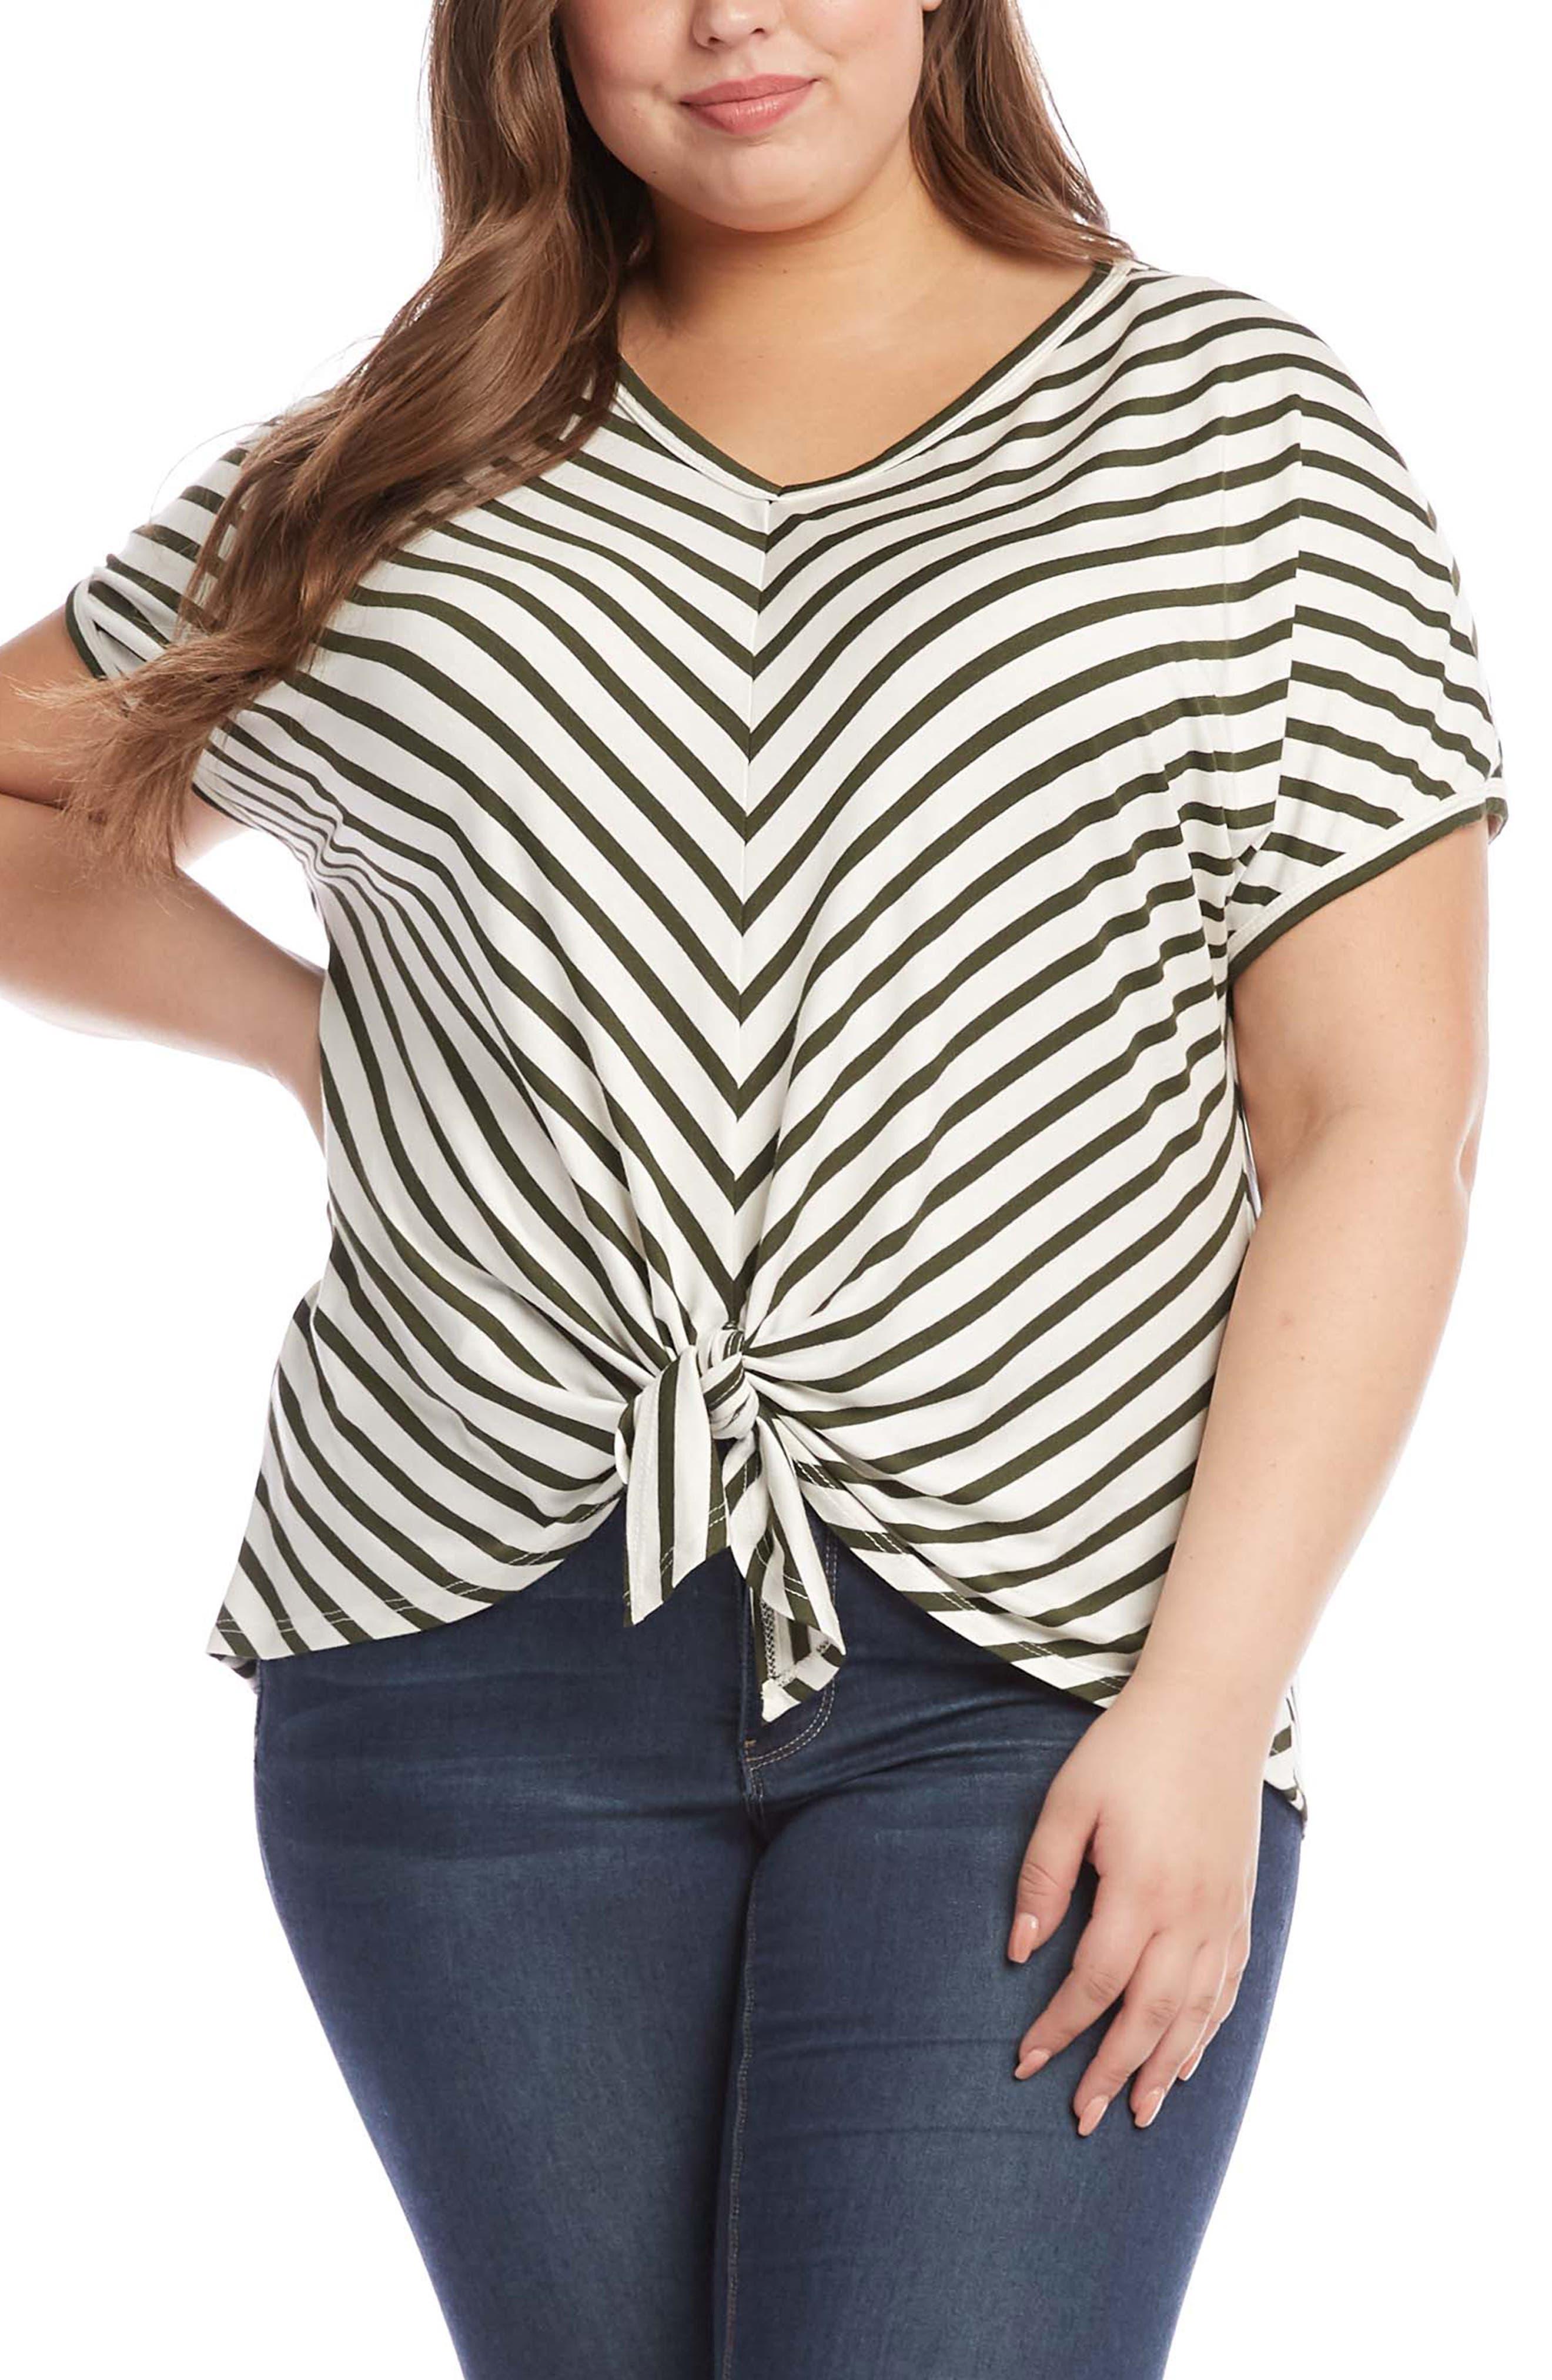 Karen Kane New Women/'s Plus Size Heather Gray Side Tie Top Sizes 0X 1X 2X 3X